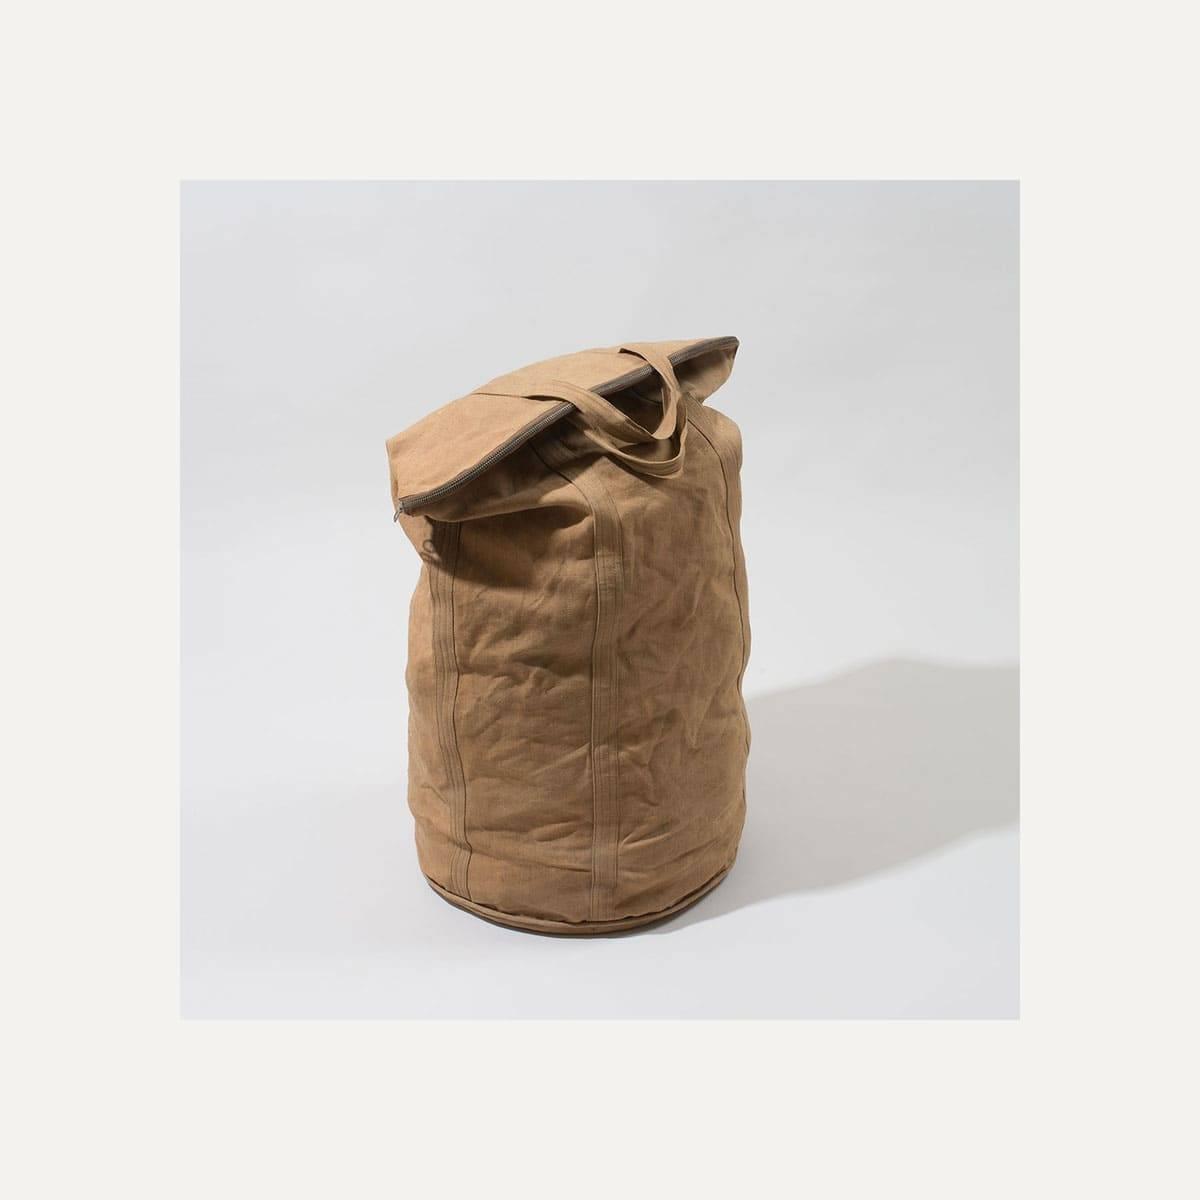 N°4: 'Cashew-colored' linen parachute bag (image n°3)